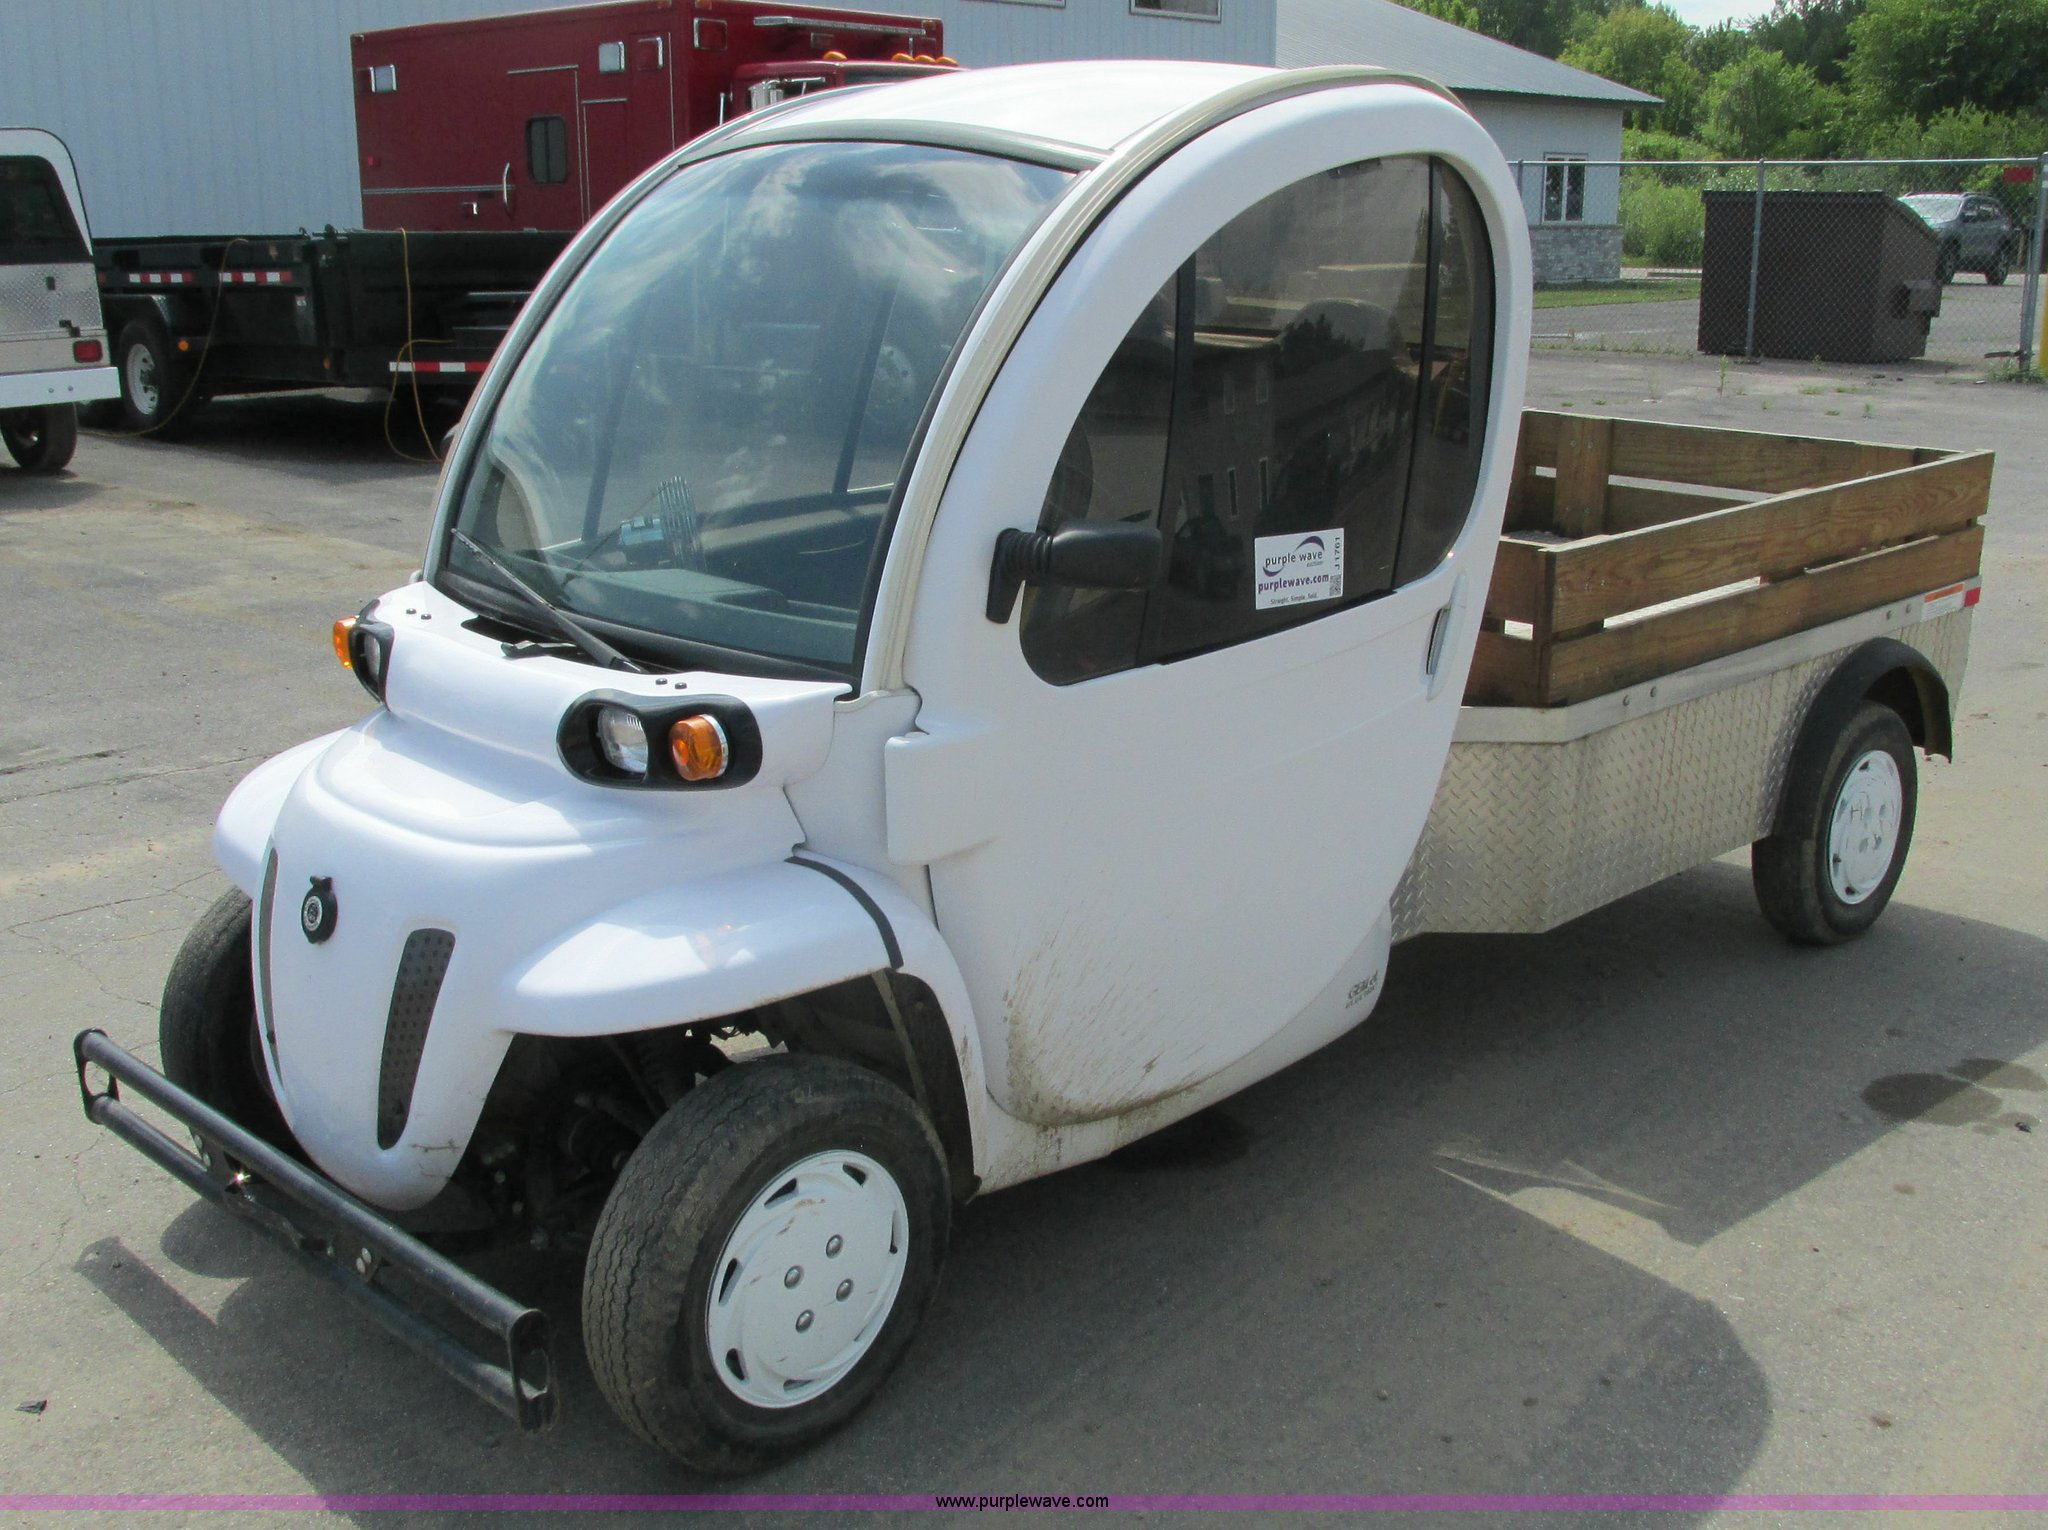 Gem Car For Sale >> 2008 Gem Car Gem El Electric Utility Cart Item J1761 Sol